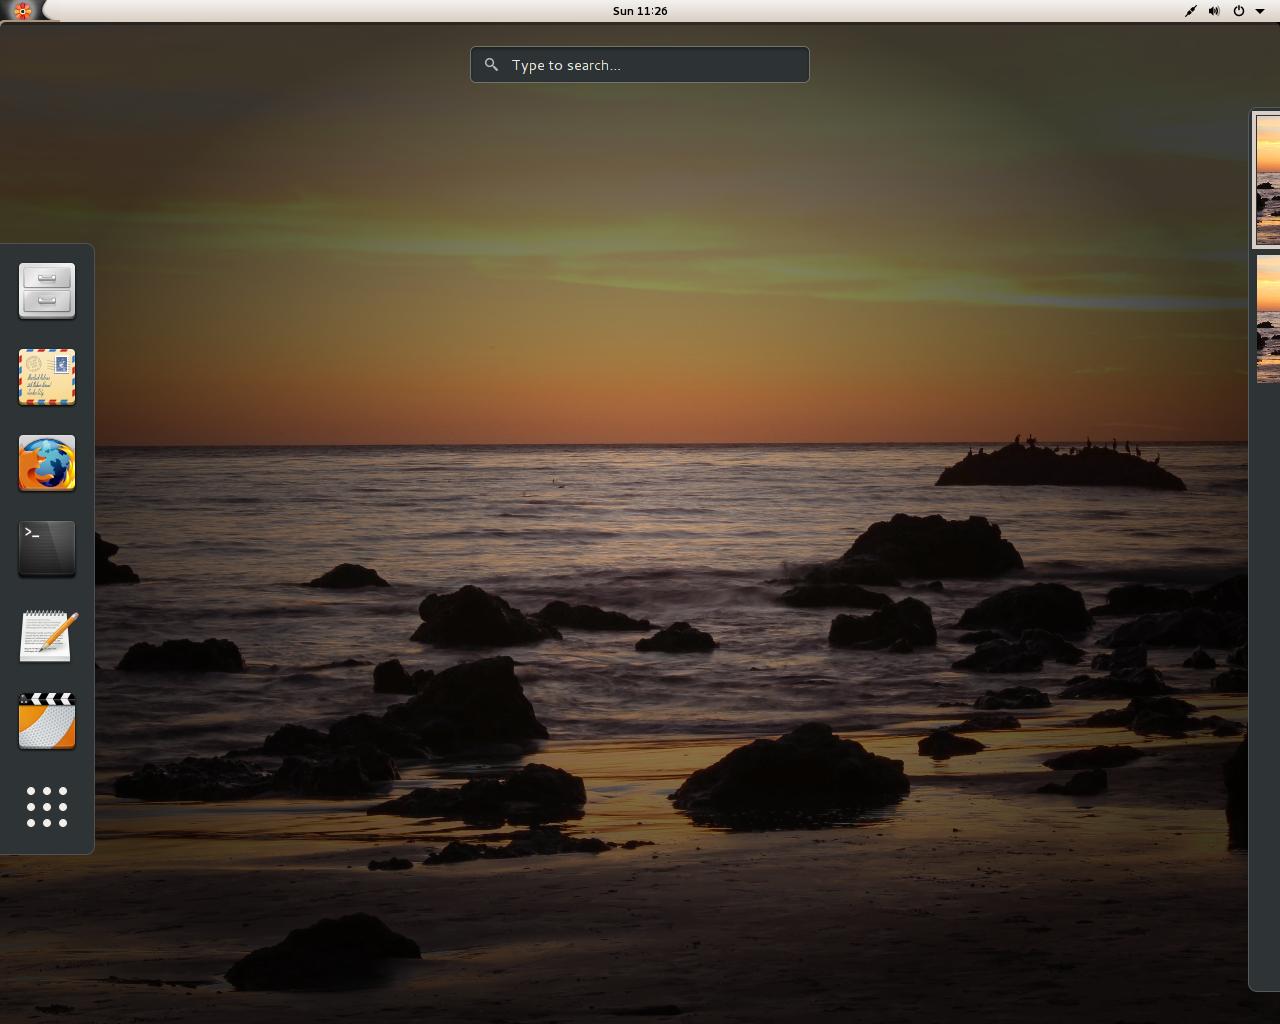 Parsix GNU/Linux 8.15 发布,Linux 启动运行光盘-芊雅企服